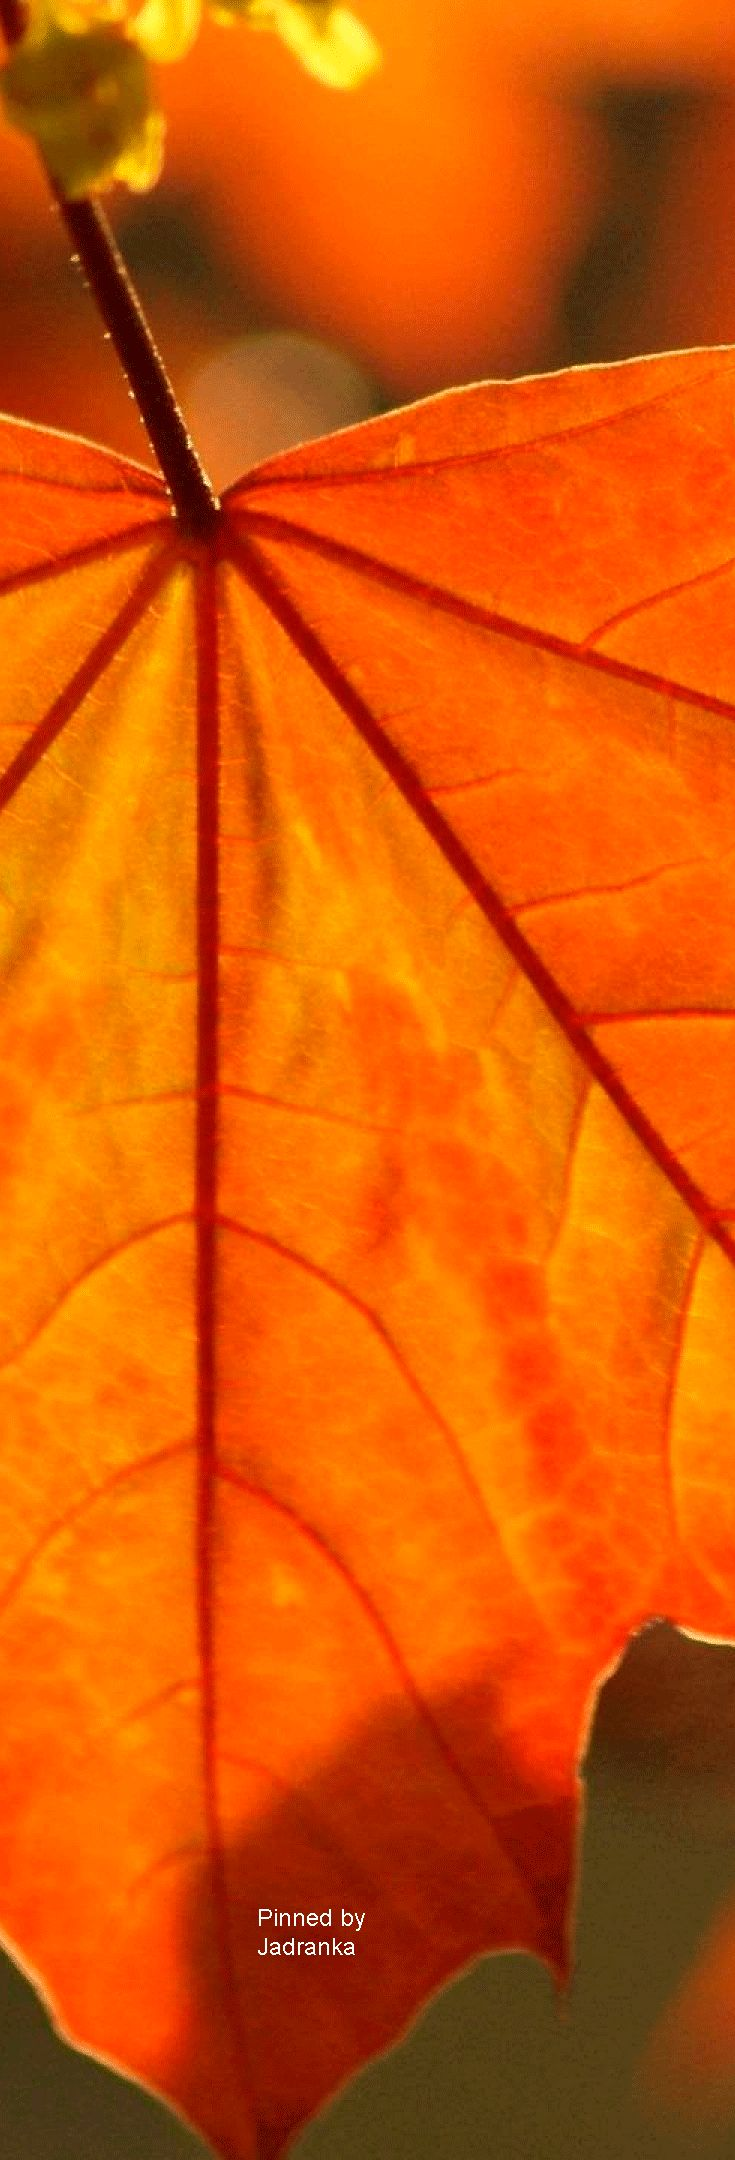 Beautiful Autumn Orange Leaf